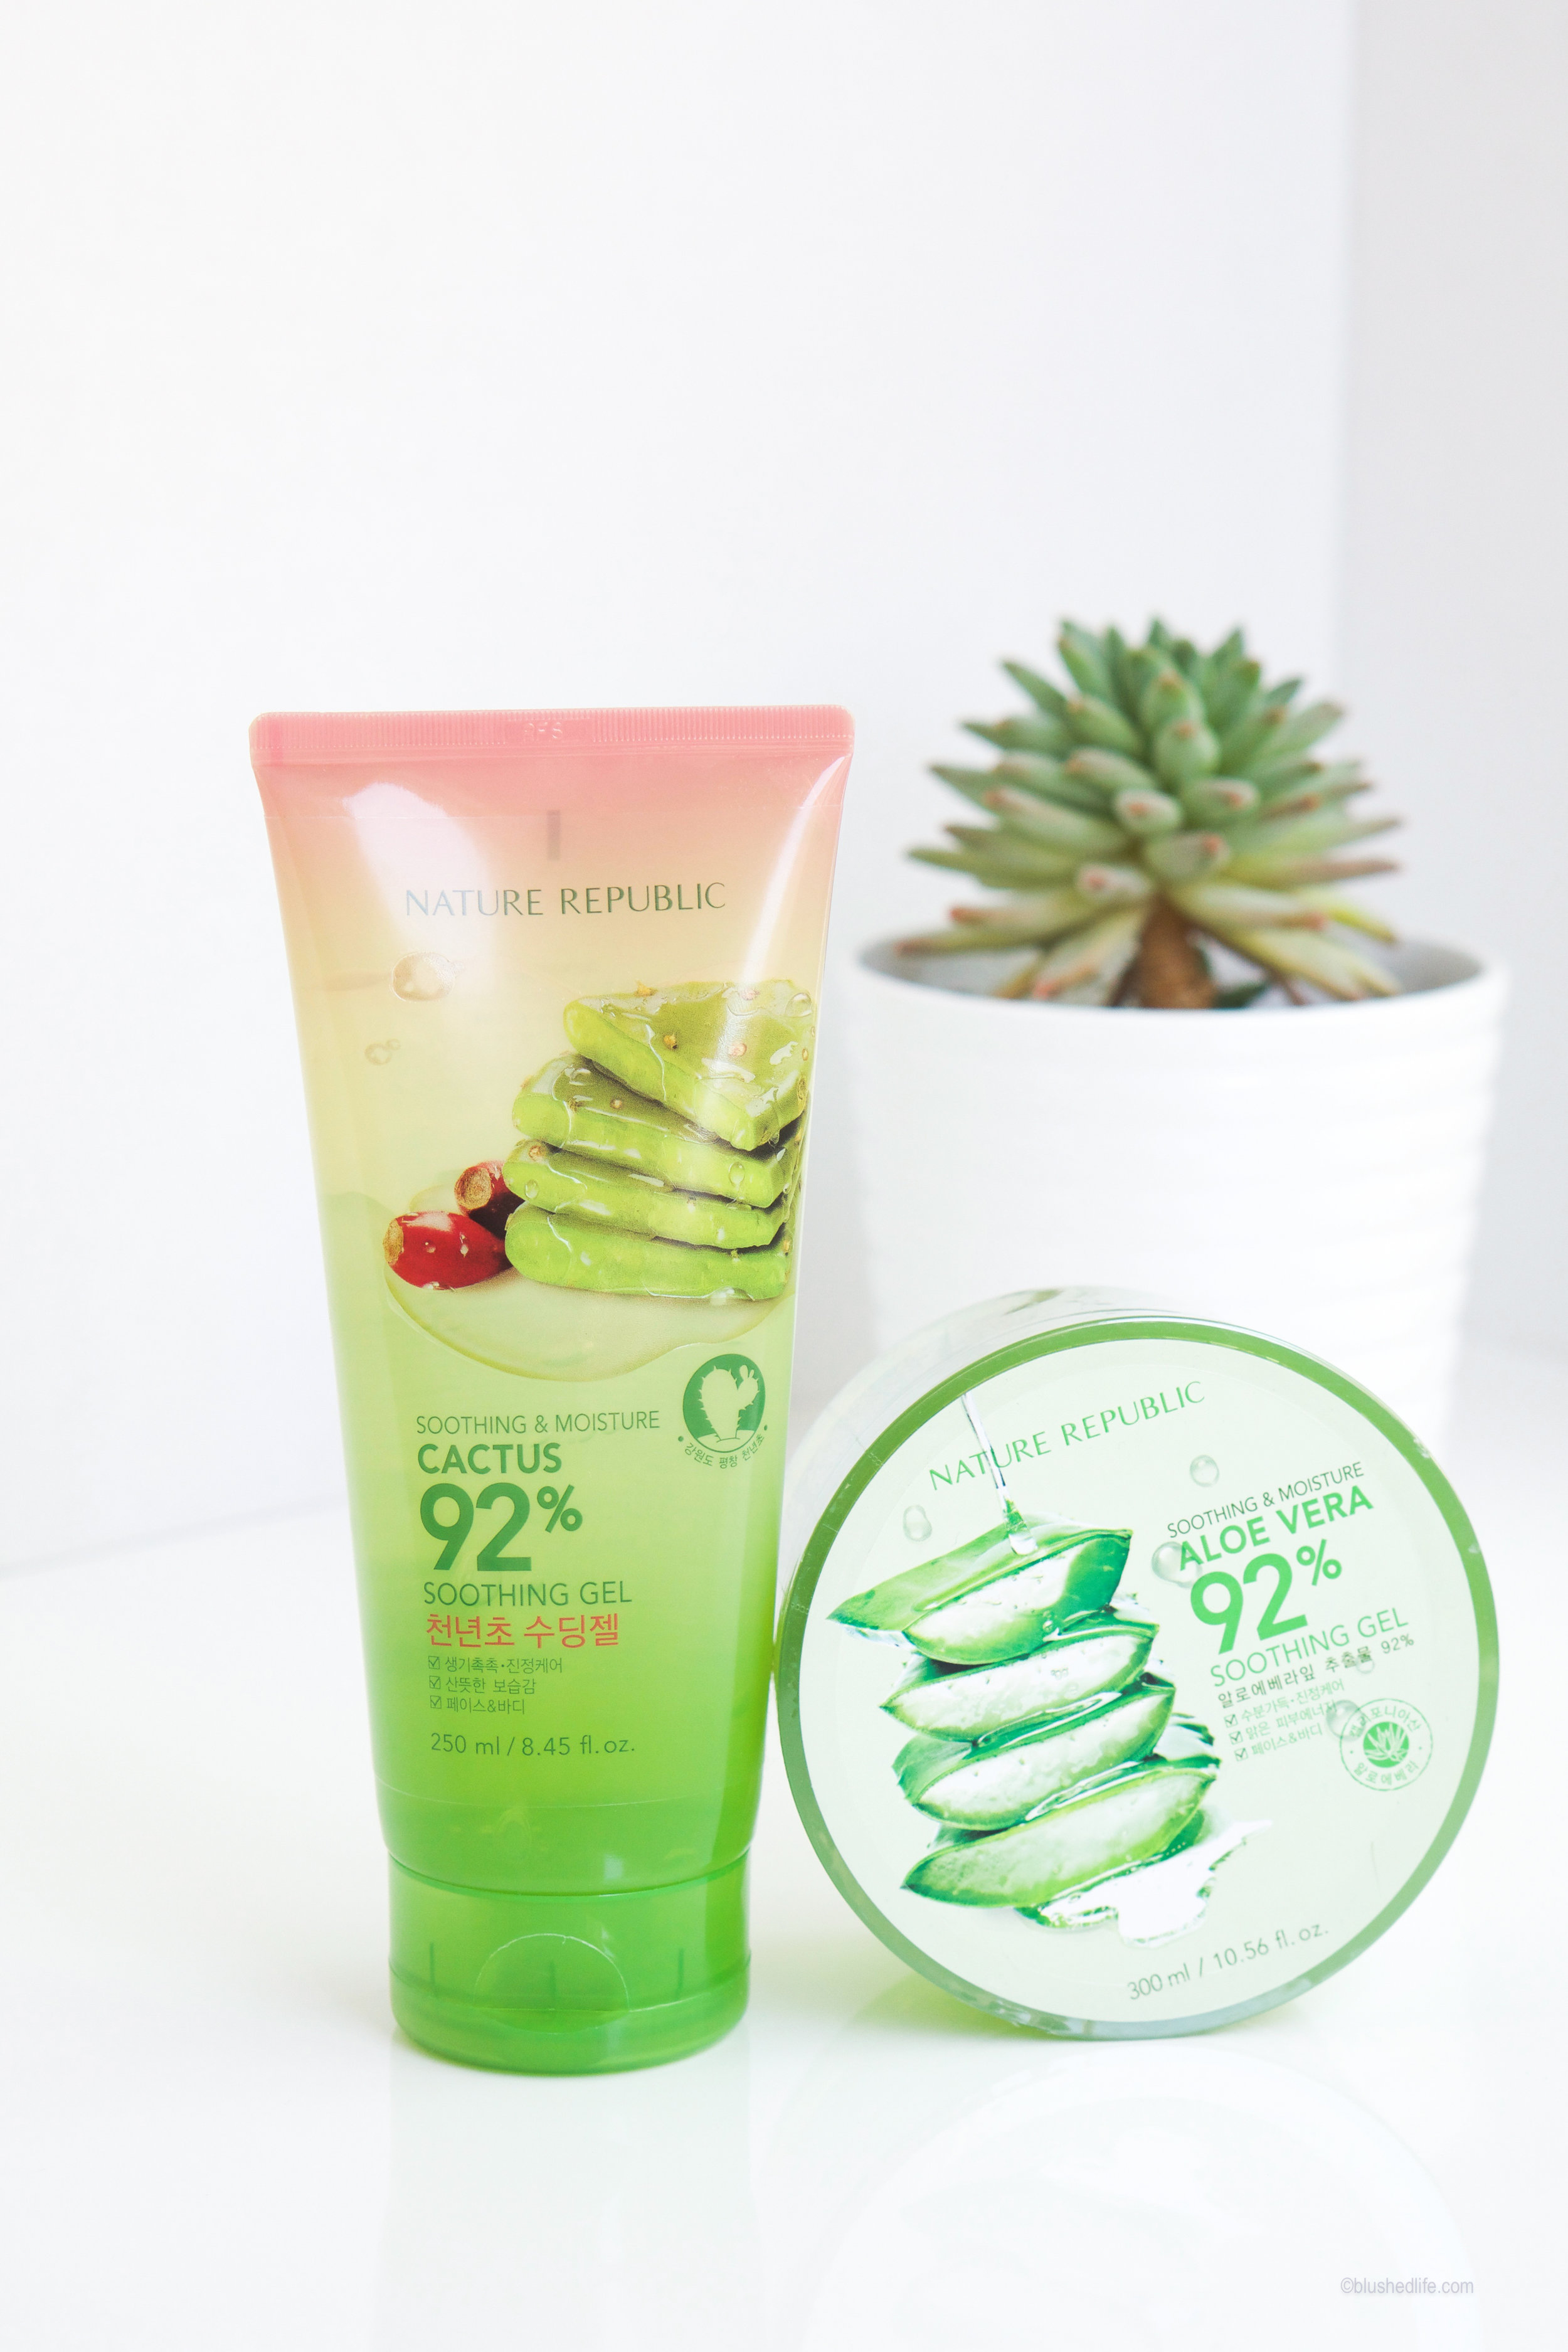 Nature Republic Aloe Vera Soothing Gel Vs Cactus K Beauty Jeju Fresh Shooting Review Blushed Life